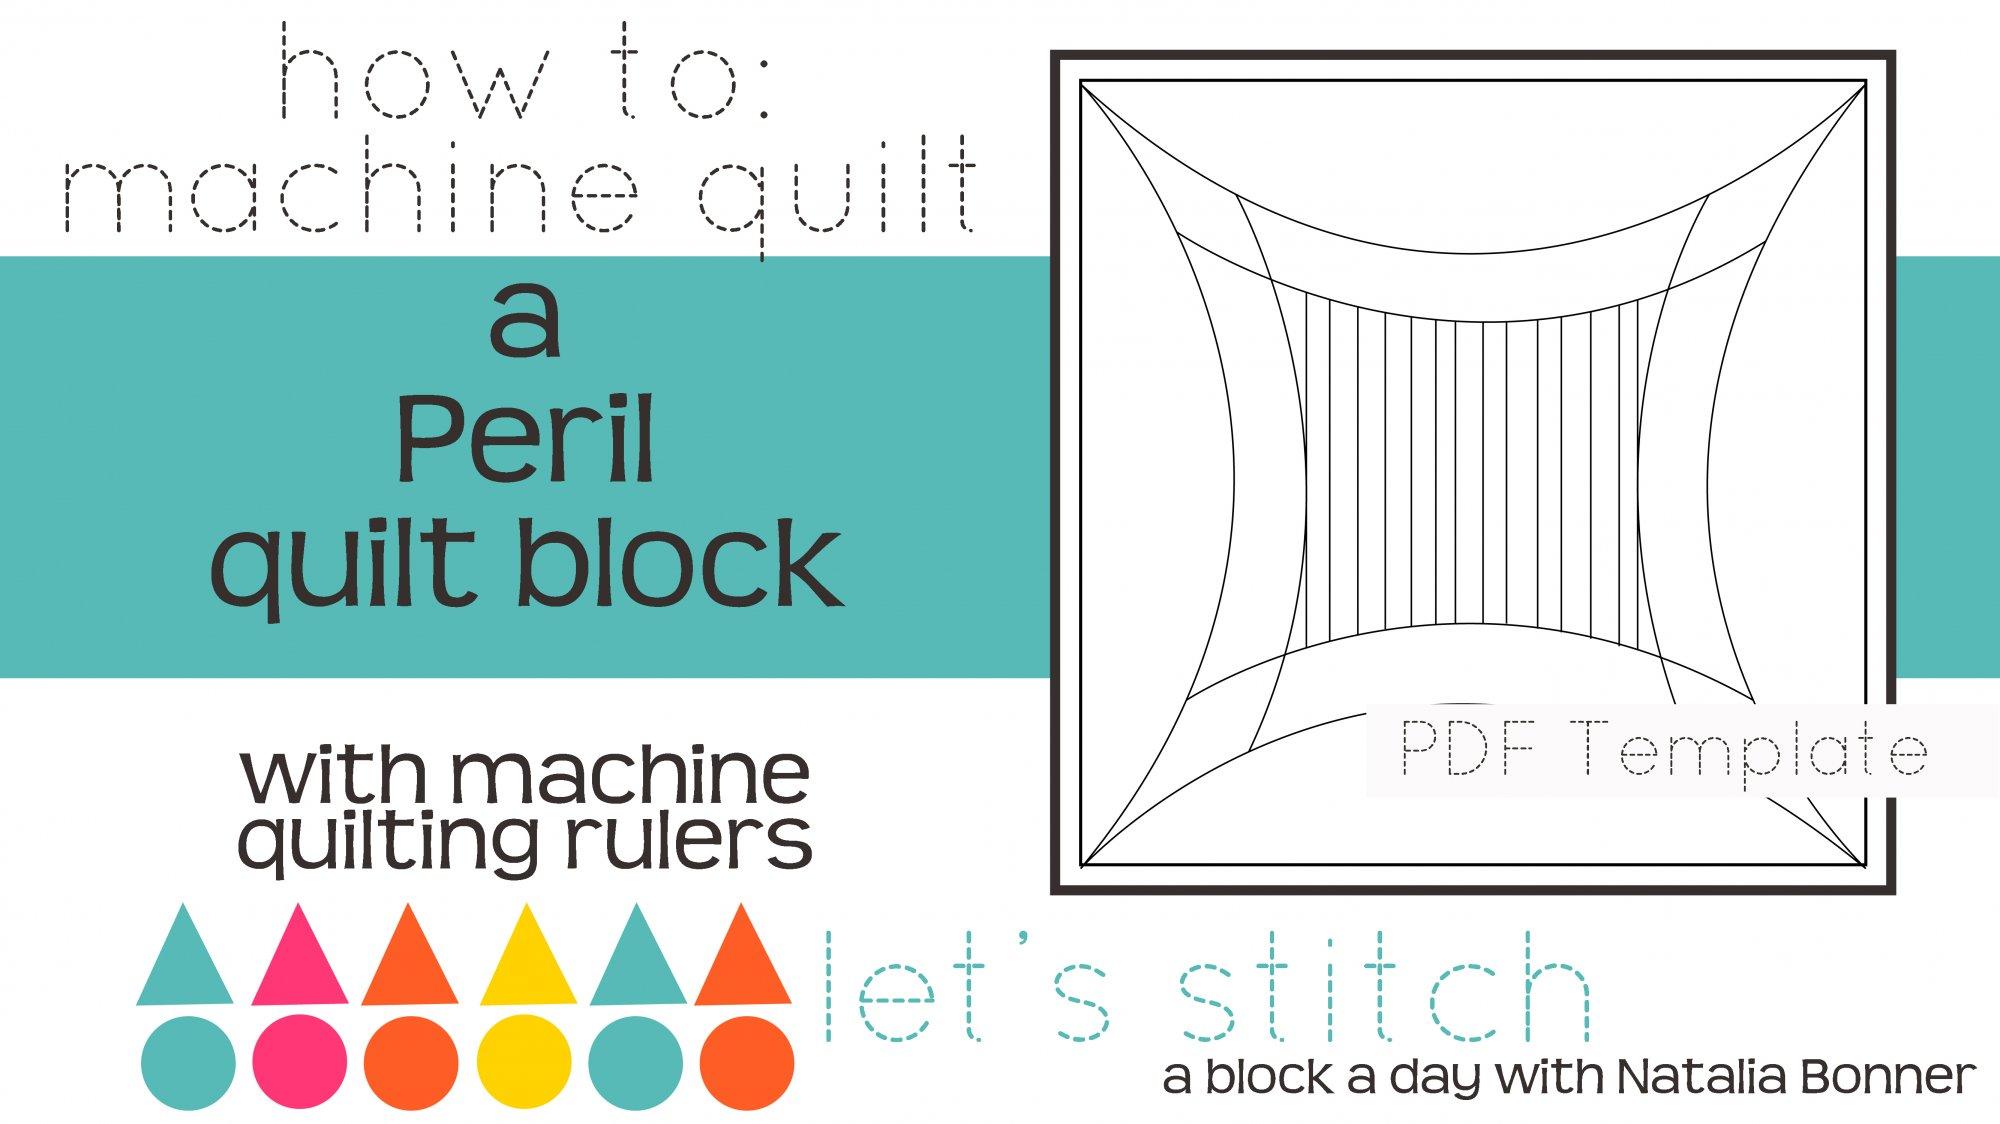 Let's Stitch - A Block a Day With Natalia Bonner - PDF - Peril